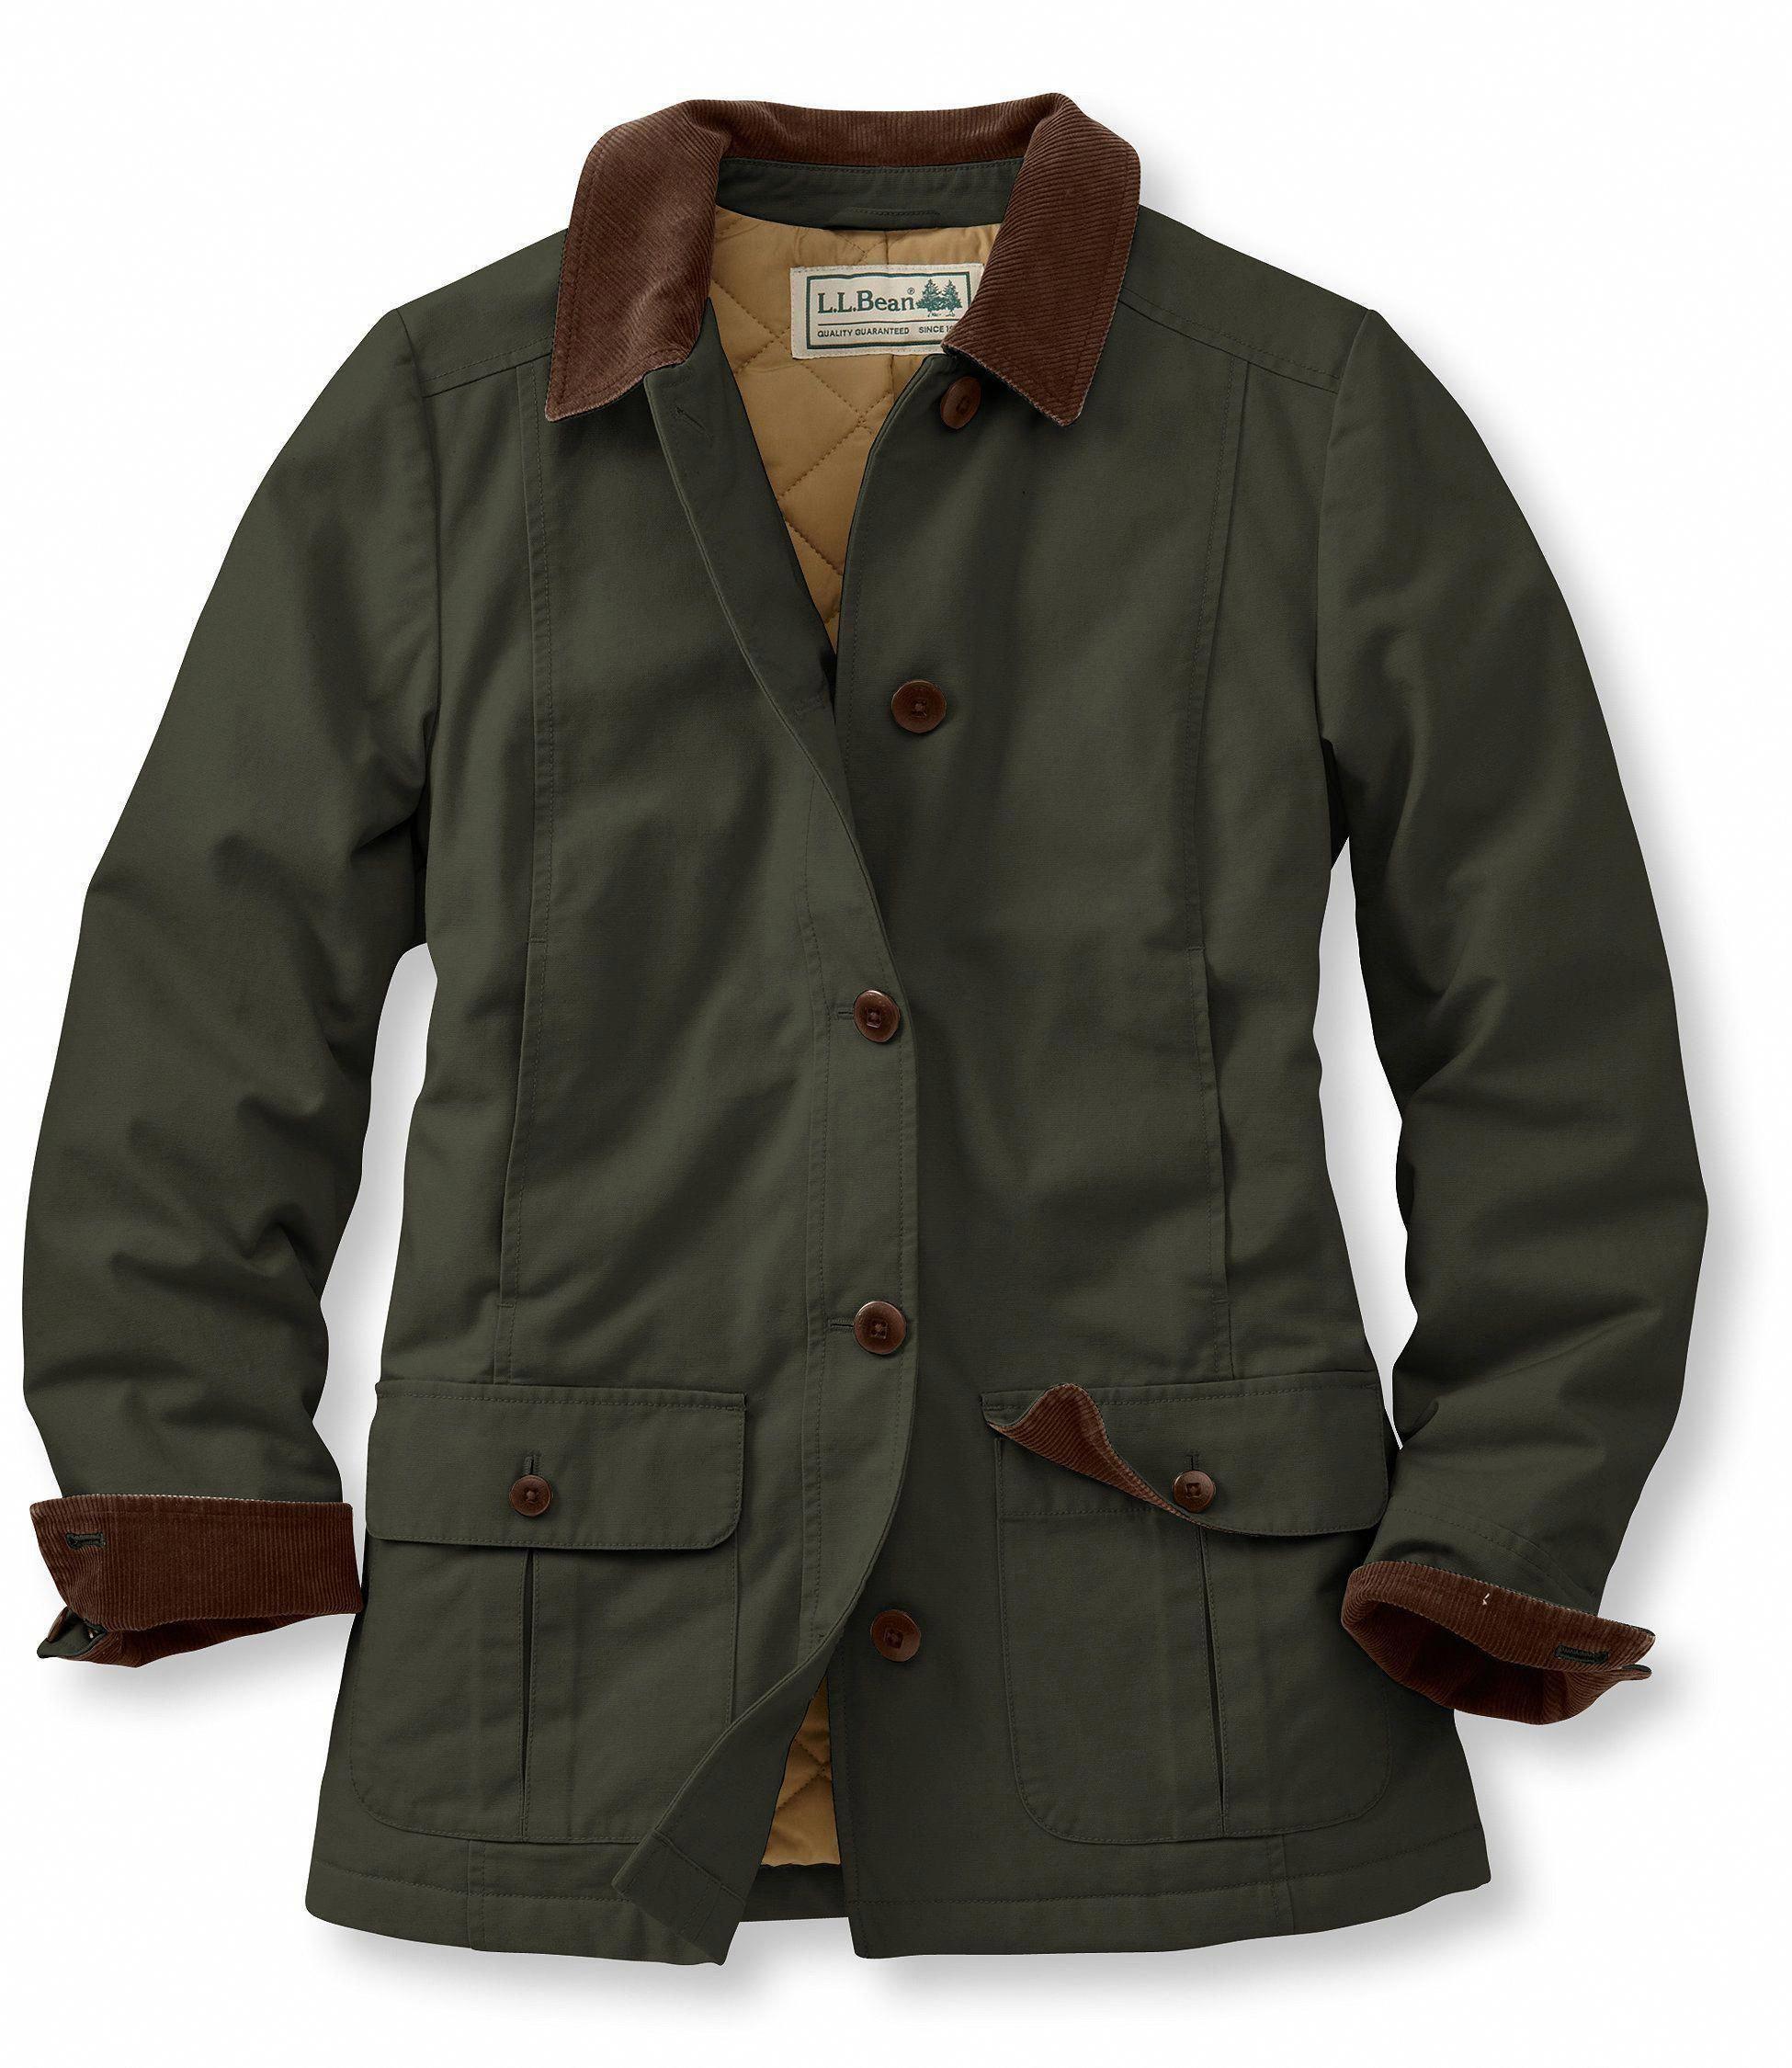 Raincoats For Women April Showers #WomensGreyRaincoat # ...